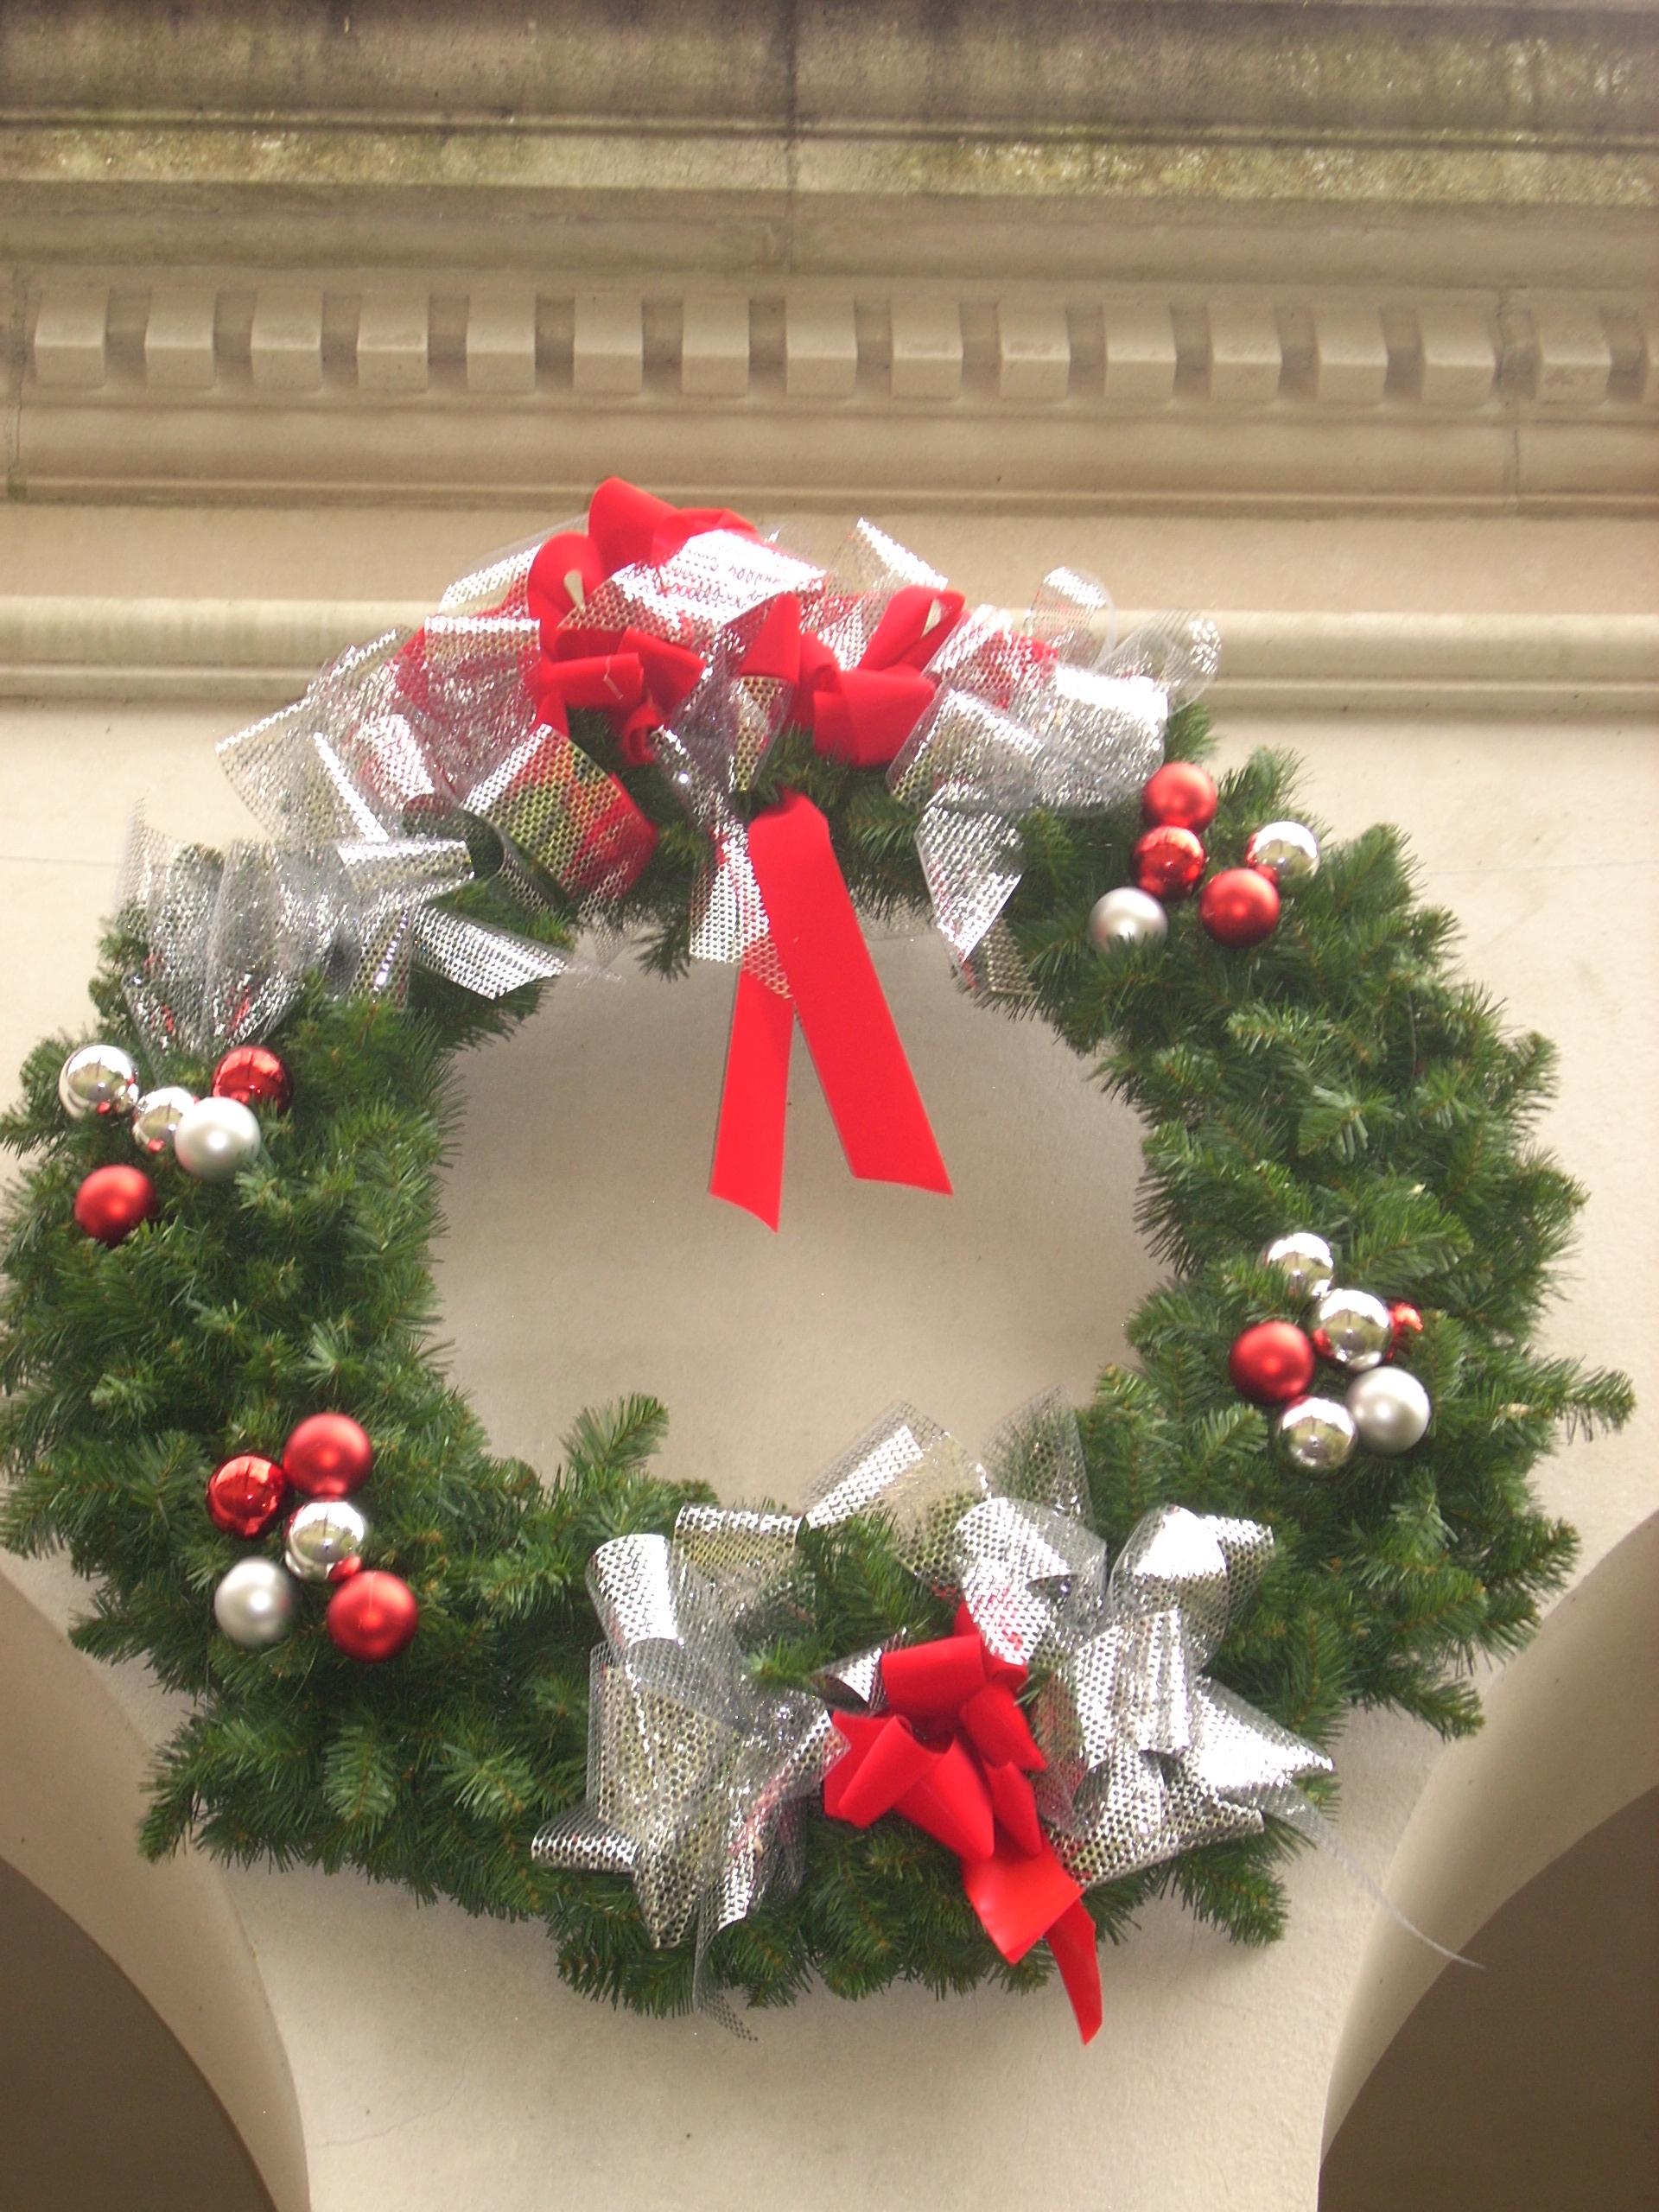 Wreath on East Terrace